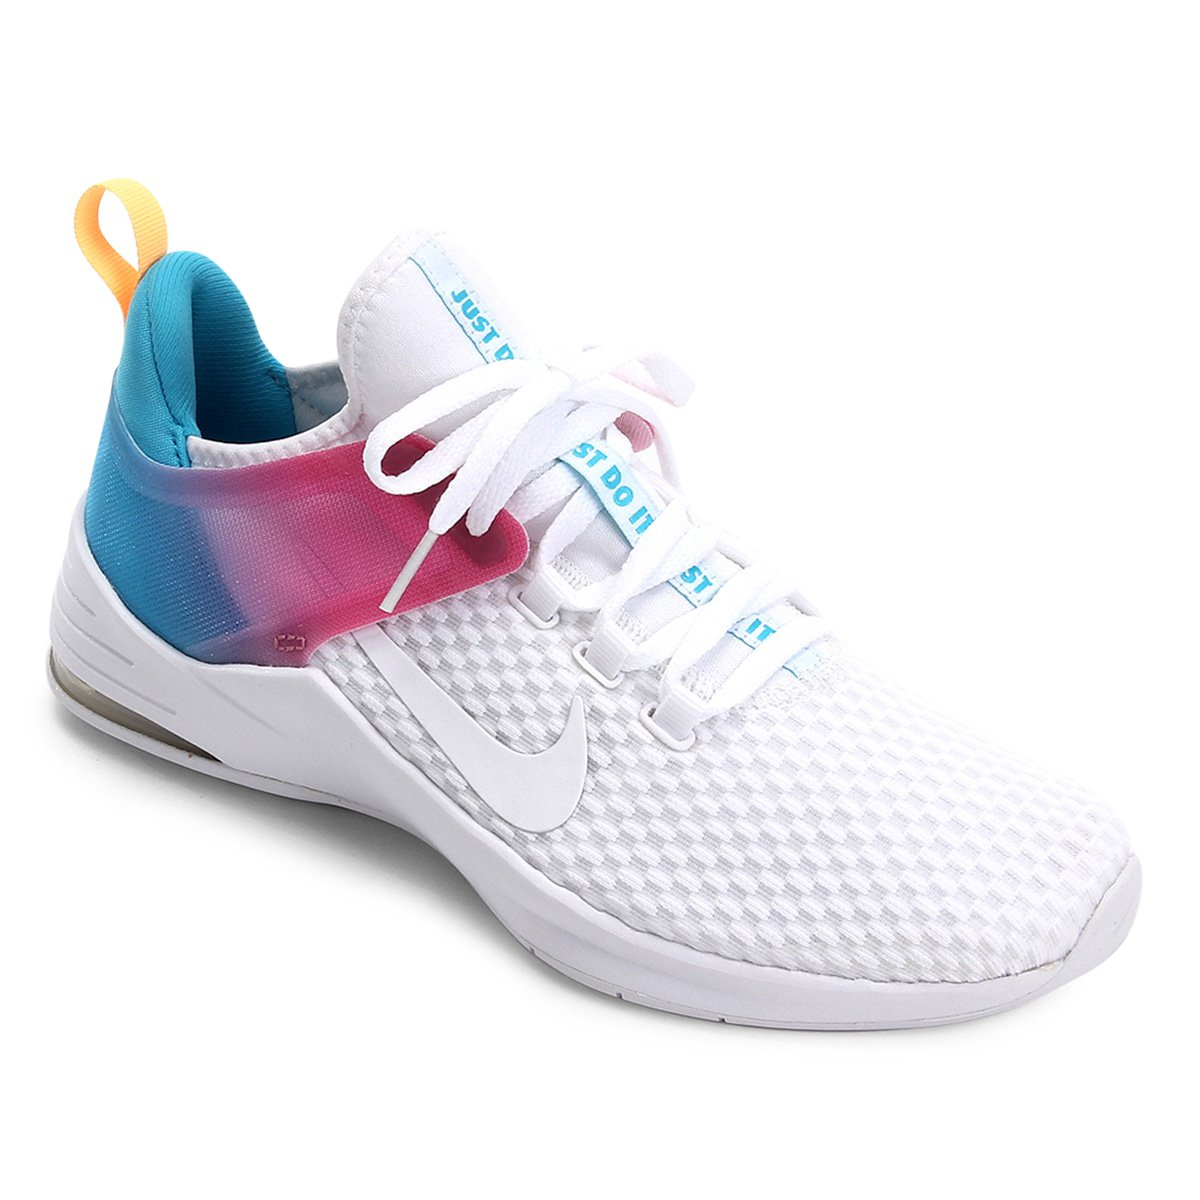 Tênis Nike Air Max Bella Tr 2 Feminino Branco E Azul